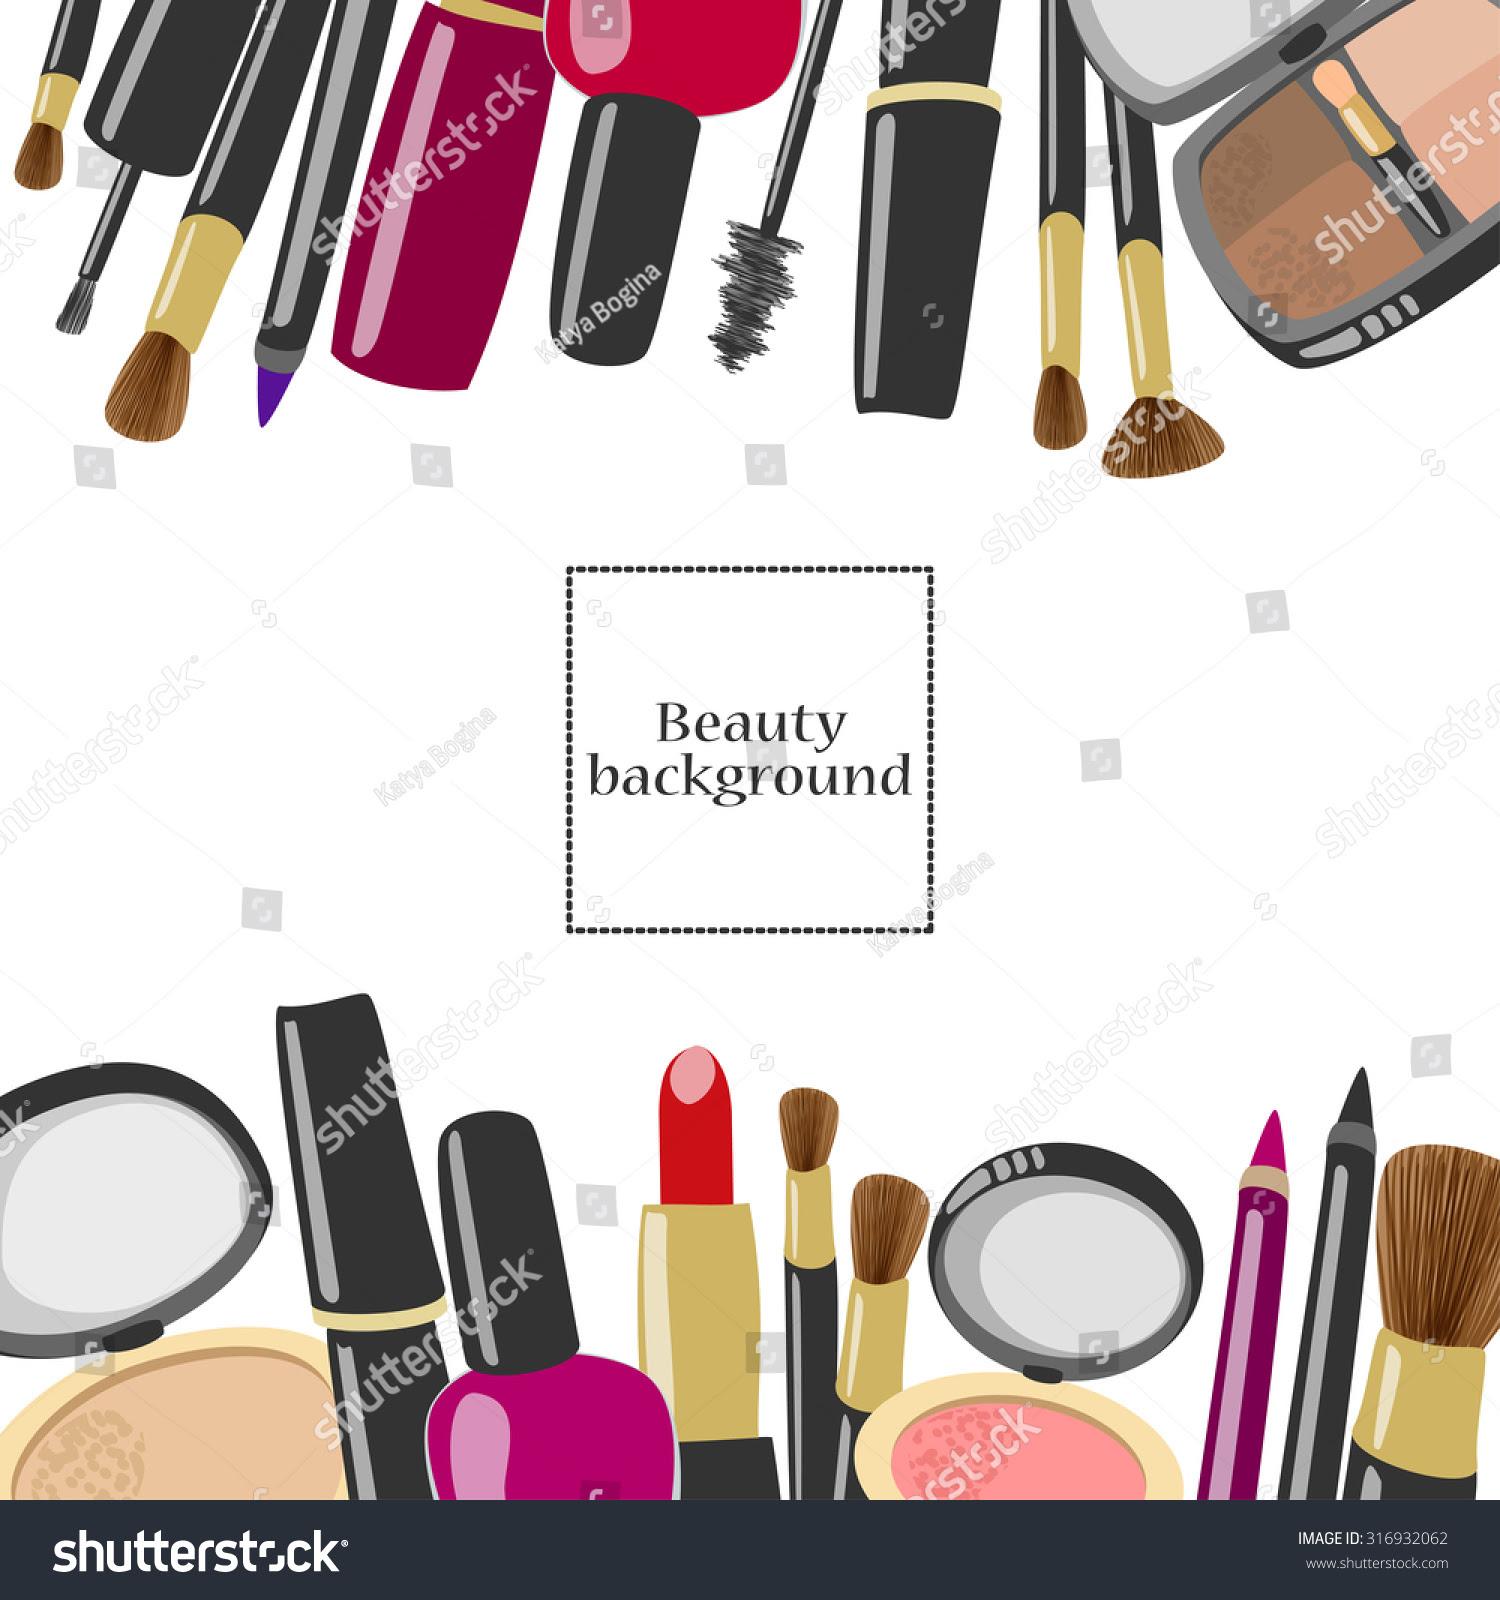 Makeup product designer